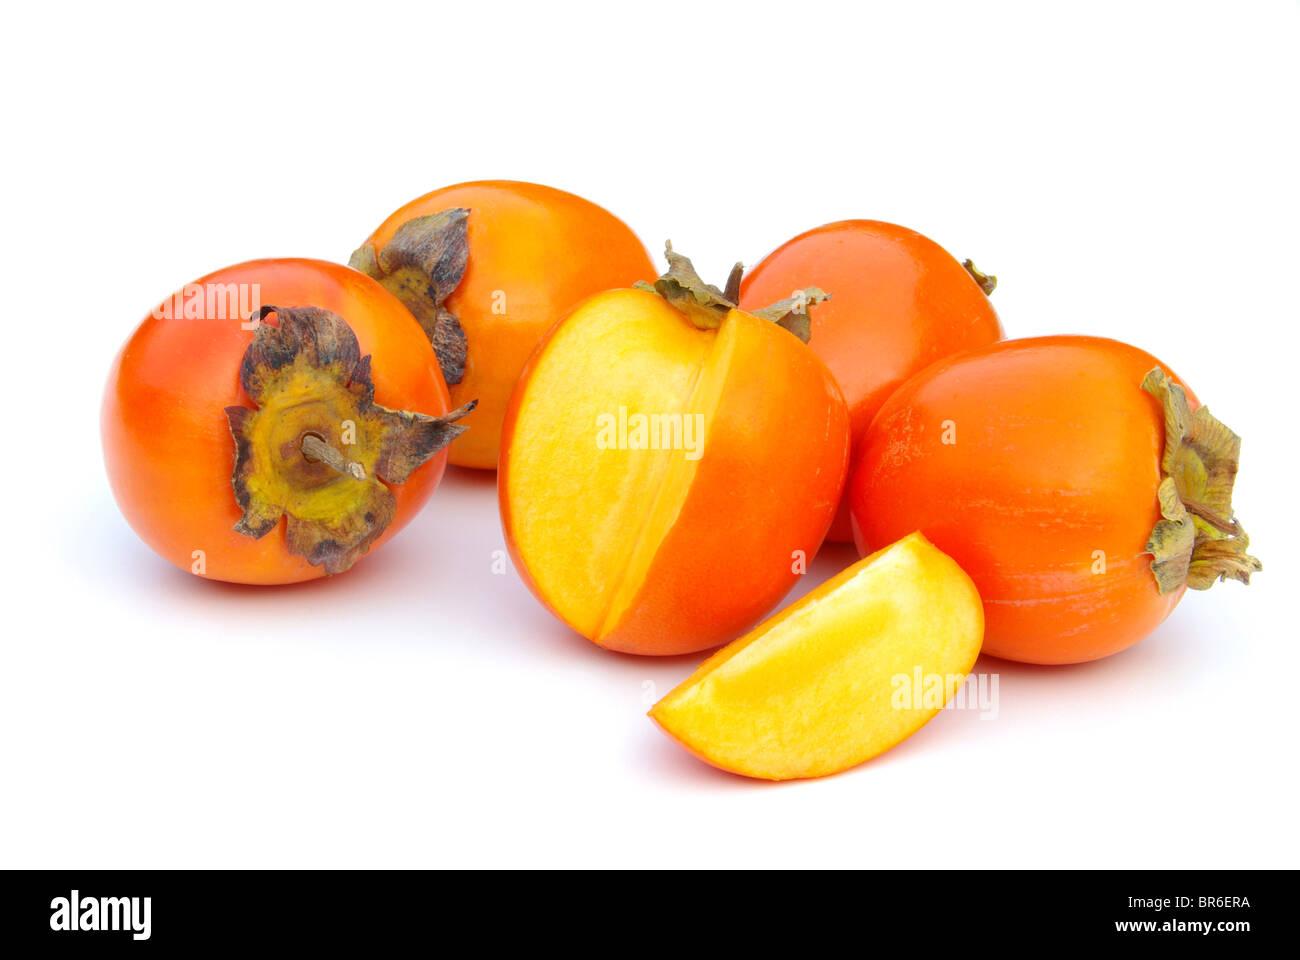 Kaki - Japanese Persimmon 16 - Stock Image